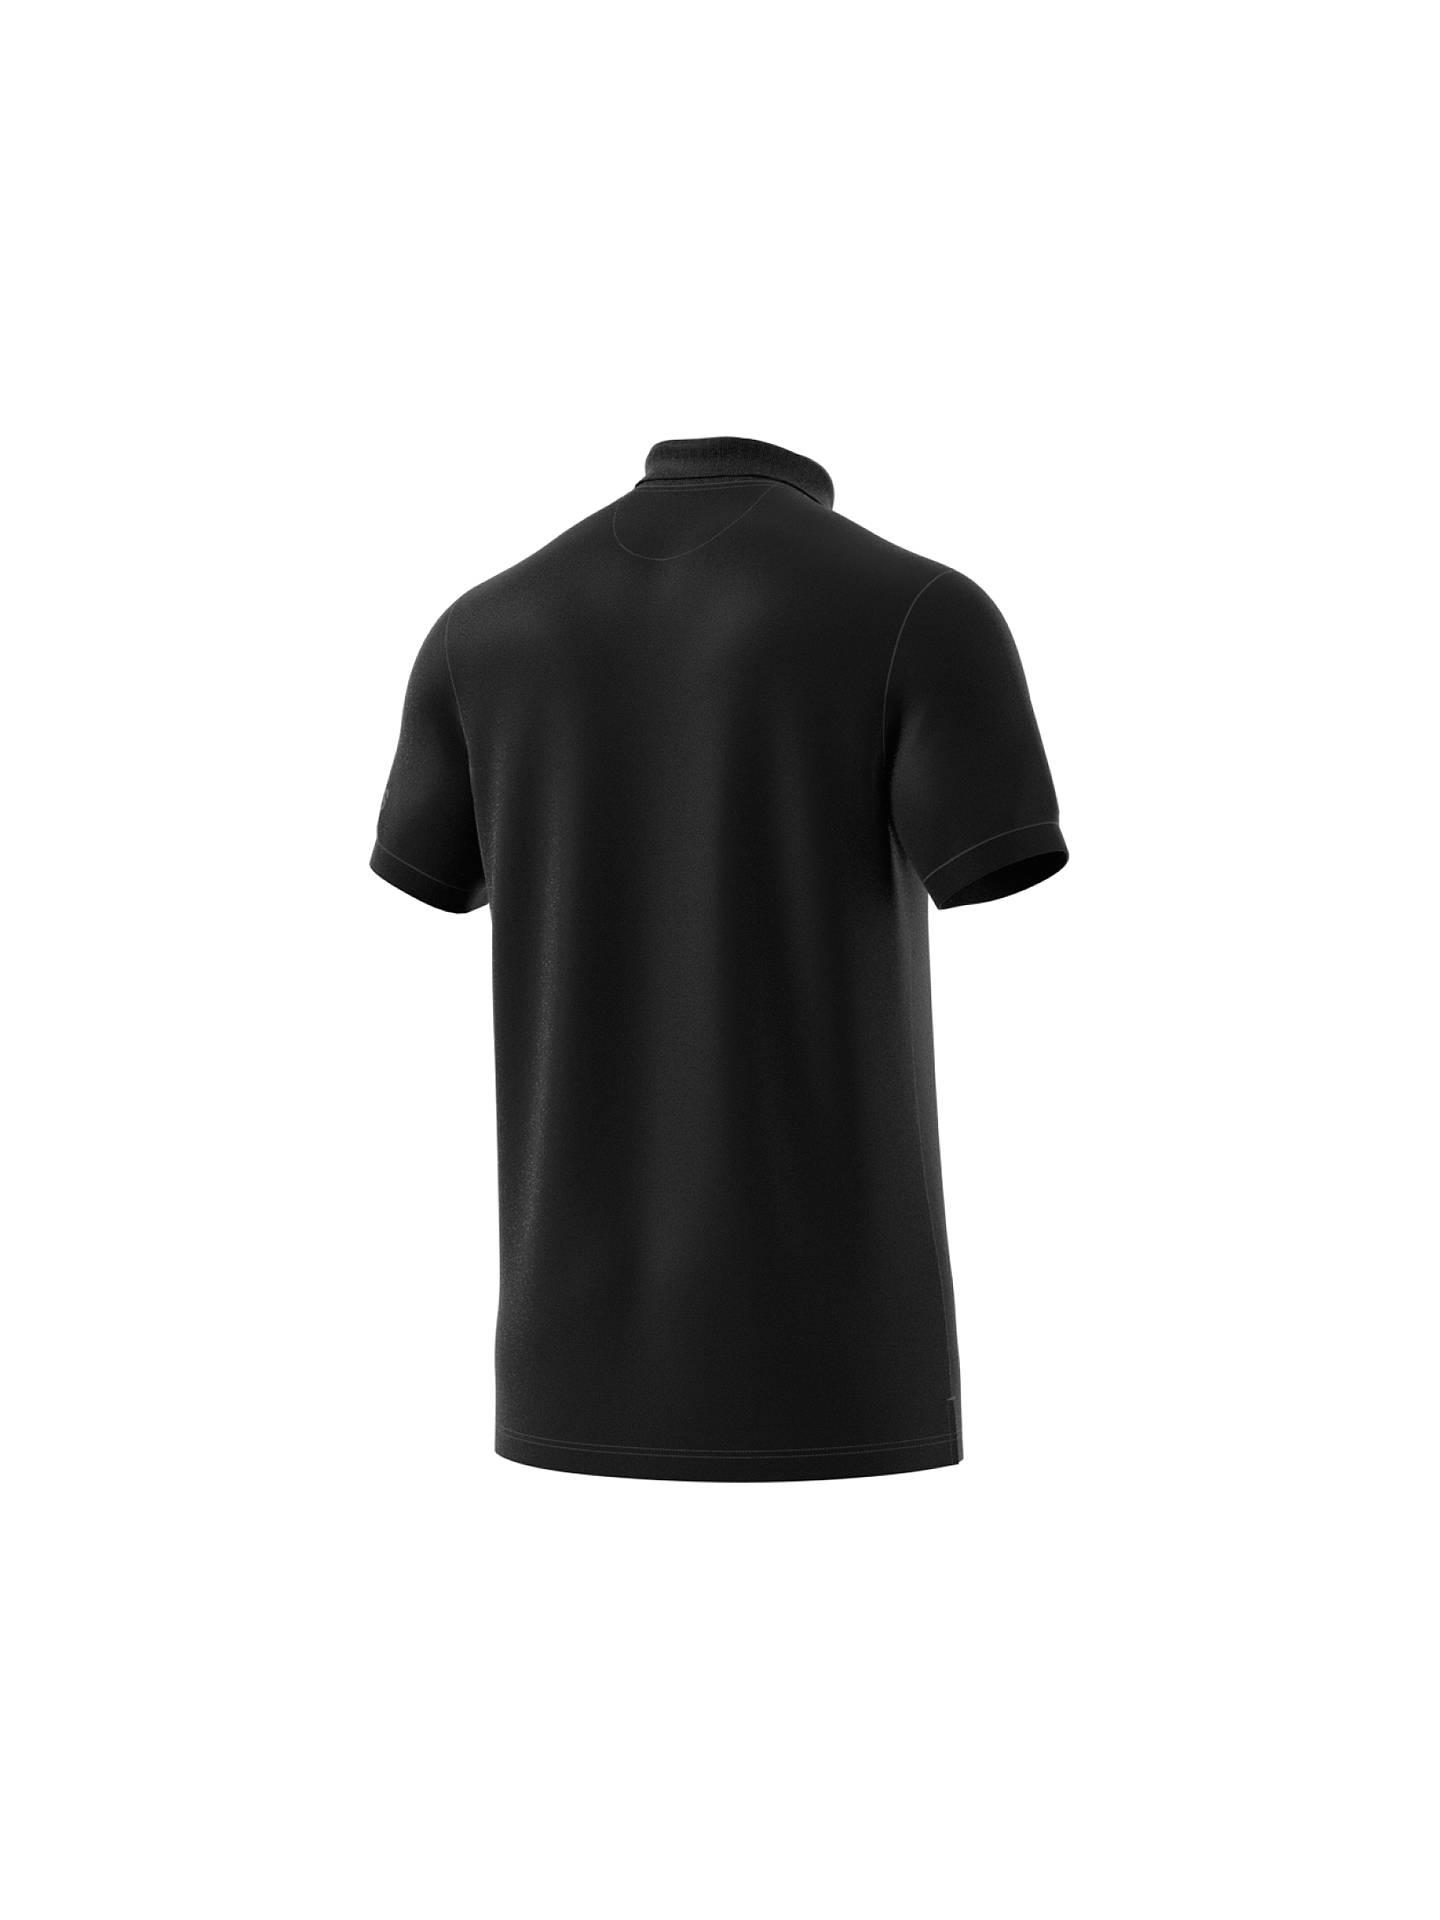 adidas New Zealand All Blacks 2018//19 Home Kids Short Sleeve Rugby Shirt Black